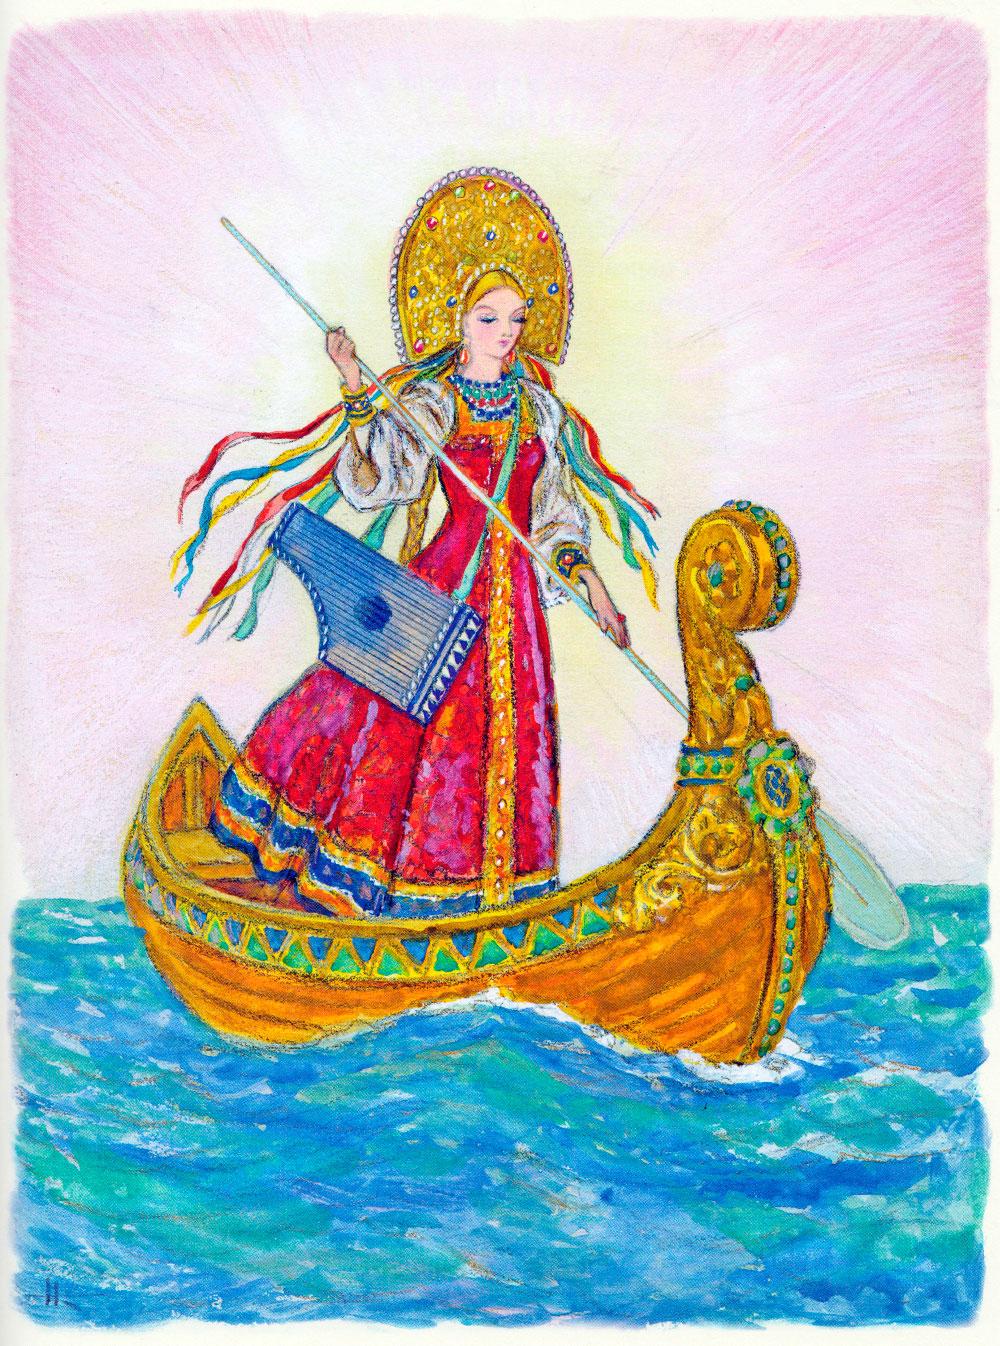 Царь-девица по морю плывет